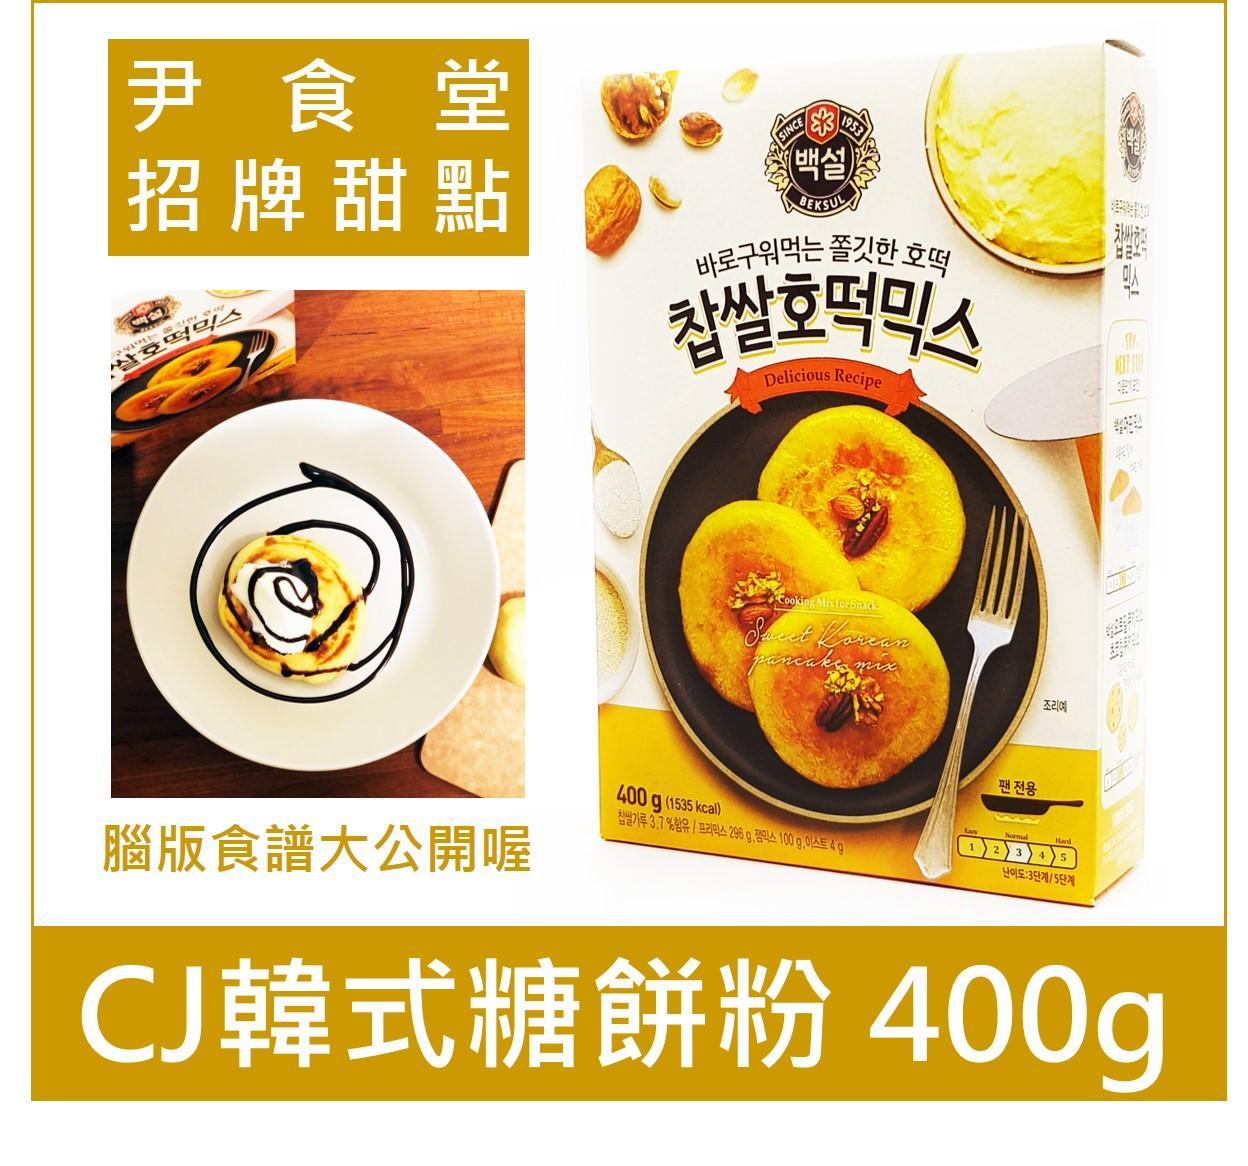 《Chara 微百貨》韓國CJ 糖 煎餅 預拌 粉 糖煎餅粉 煎餅粉 尹食堂 韓劇 DIY 糖心 糖餅 粉  400g 0